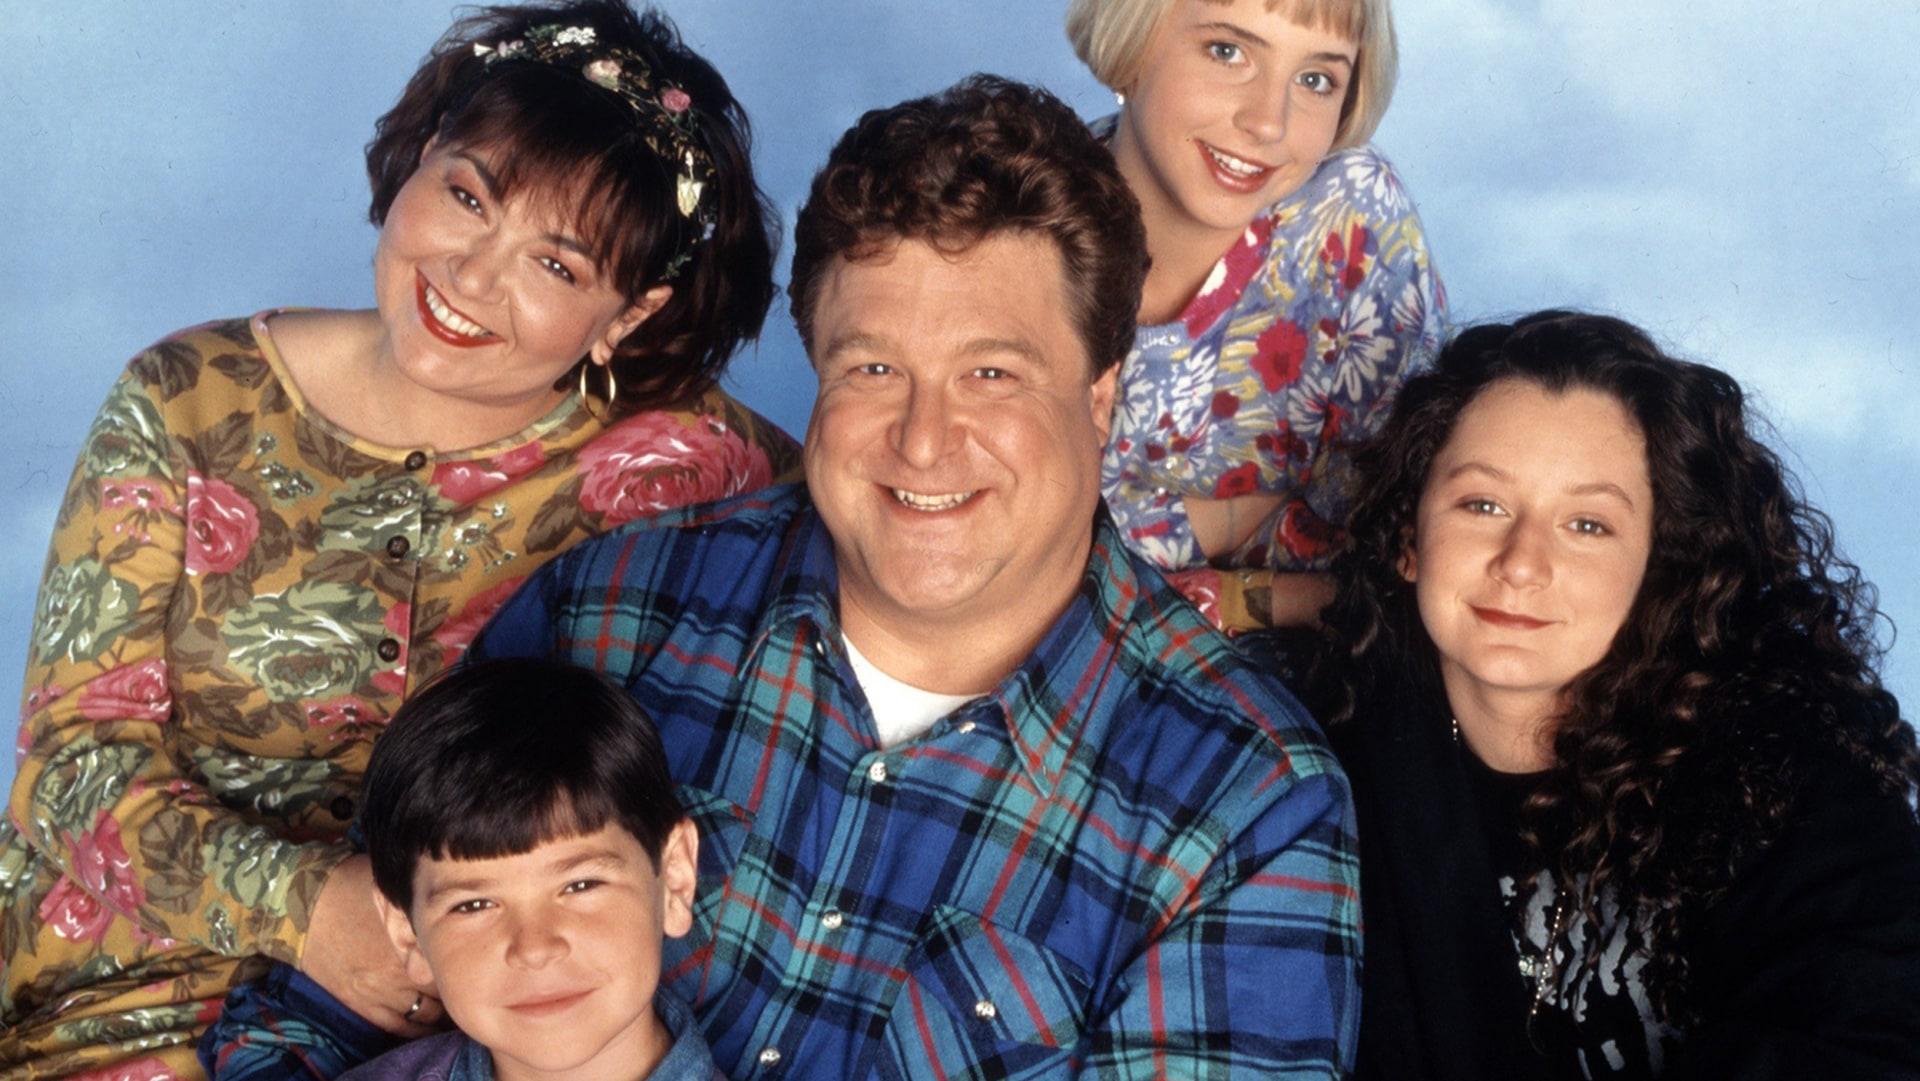 Roseanne, Michael Fishman, John Goodman, Lecy Goranson, Sara Gilbert